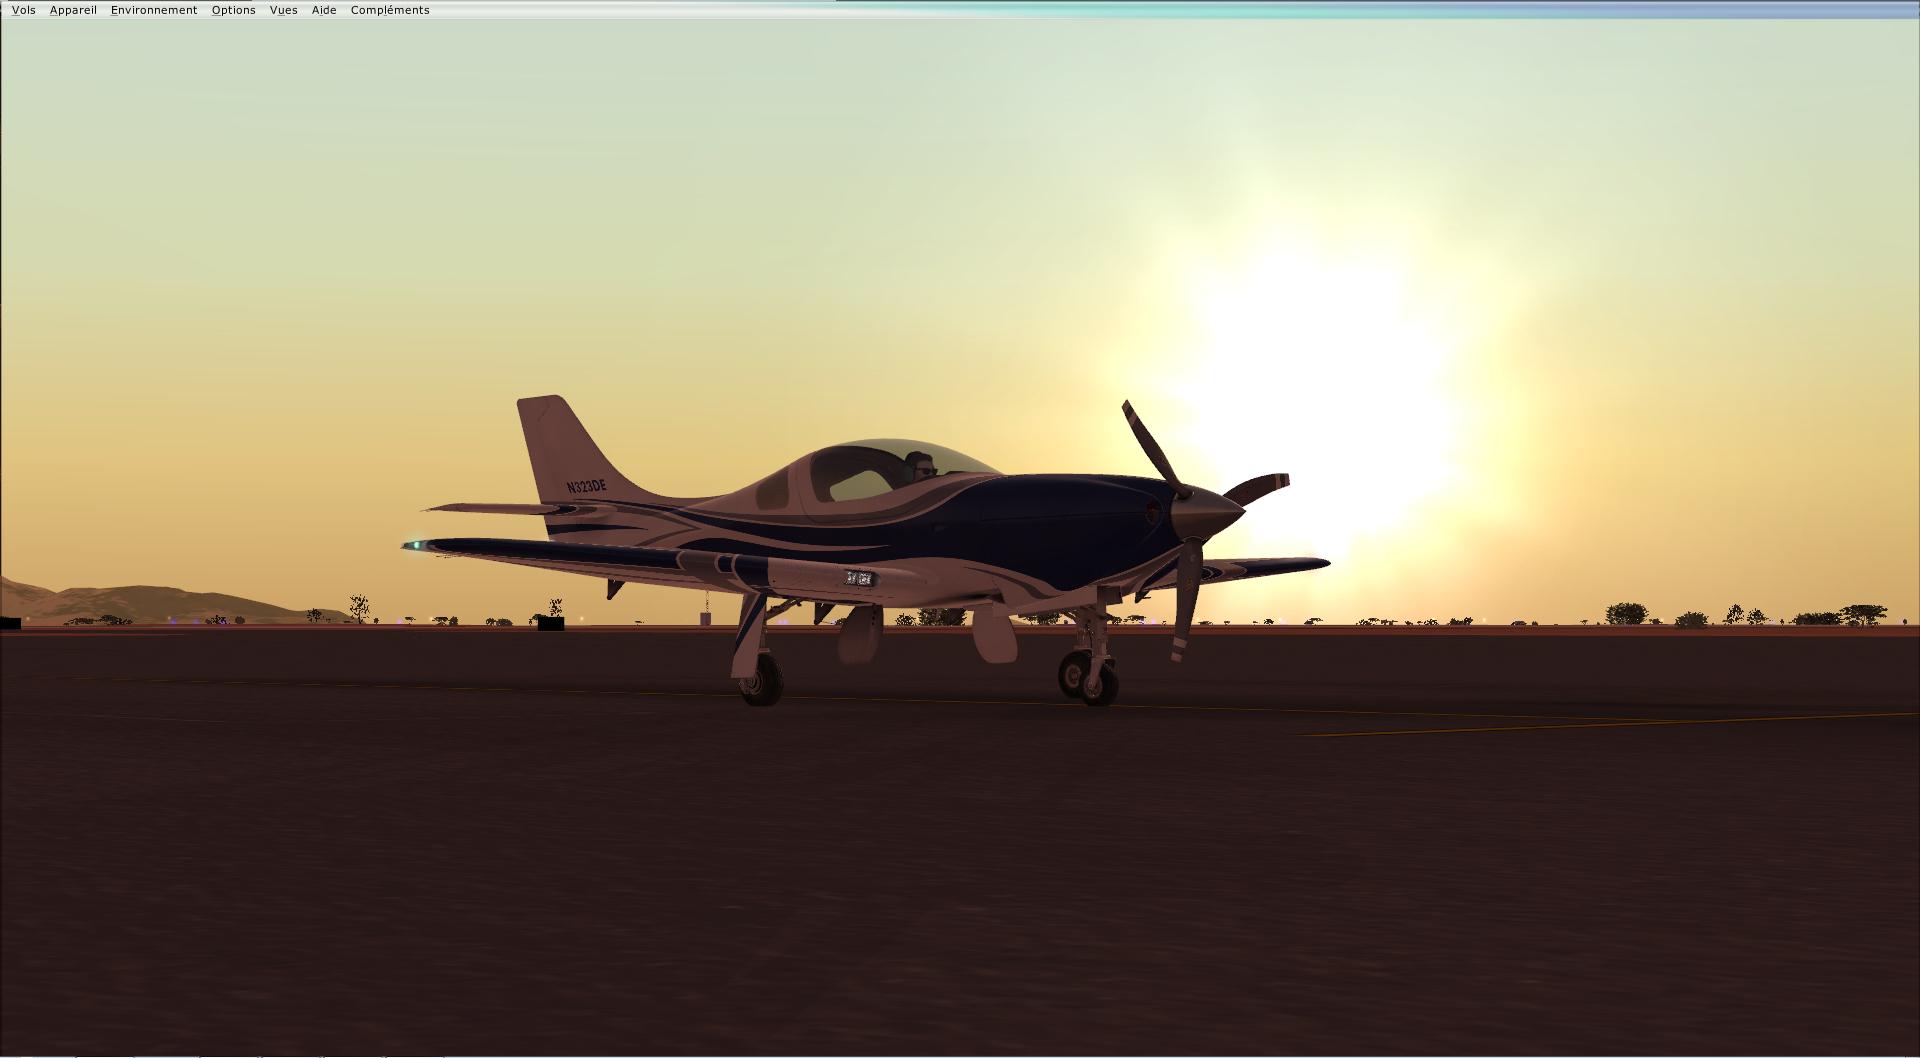 Essai demo X-Plane 10 - Page 2 8164062013113181027596